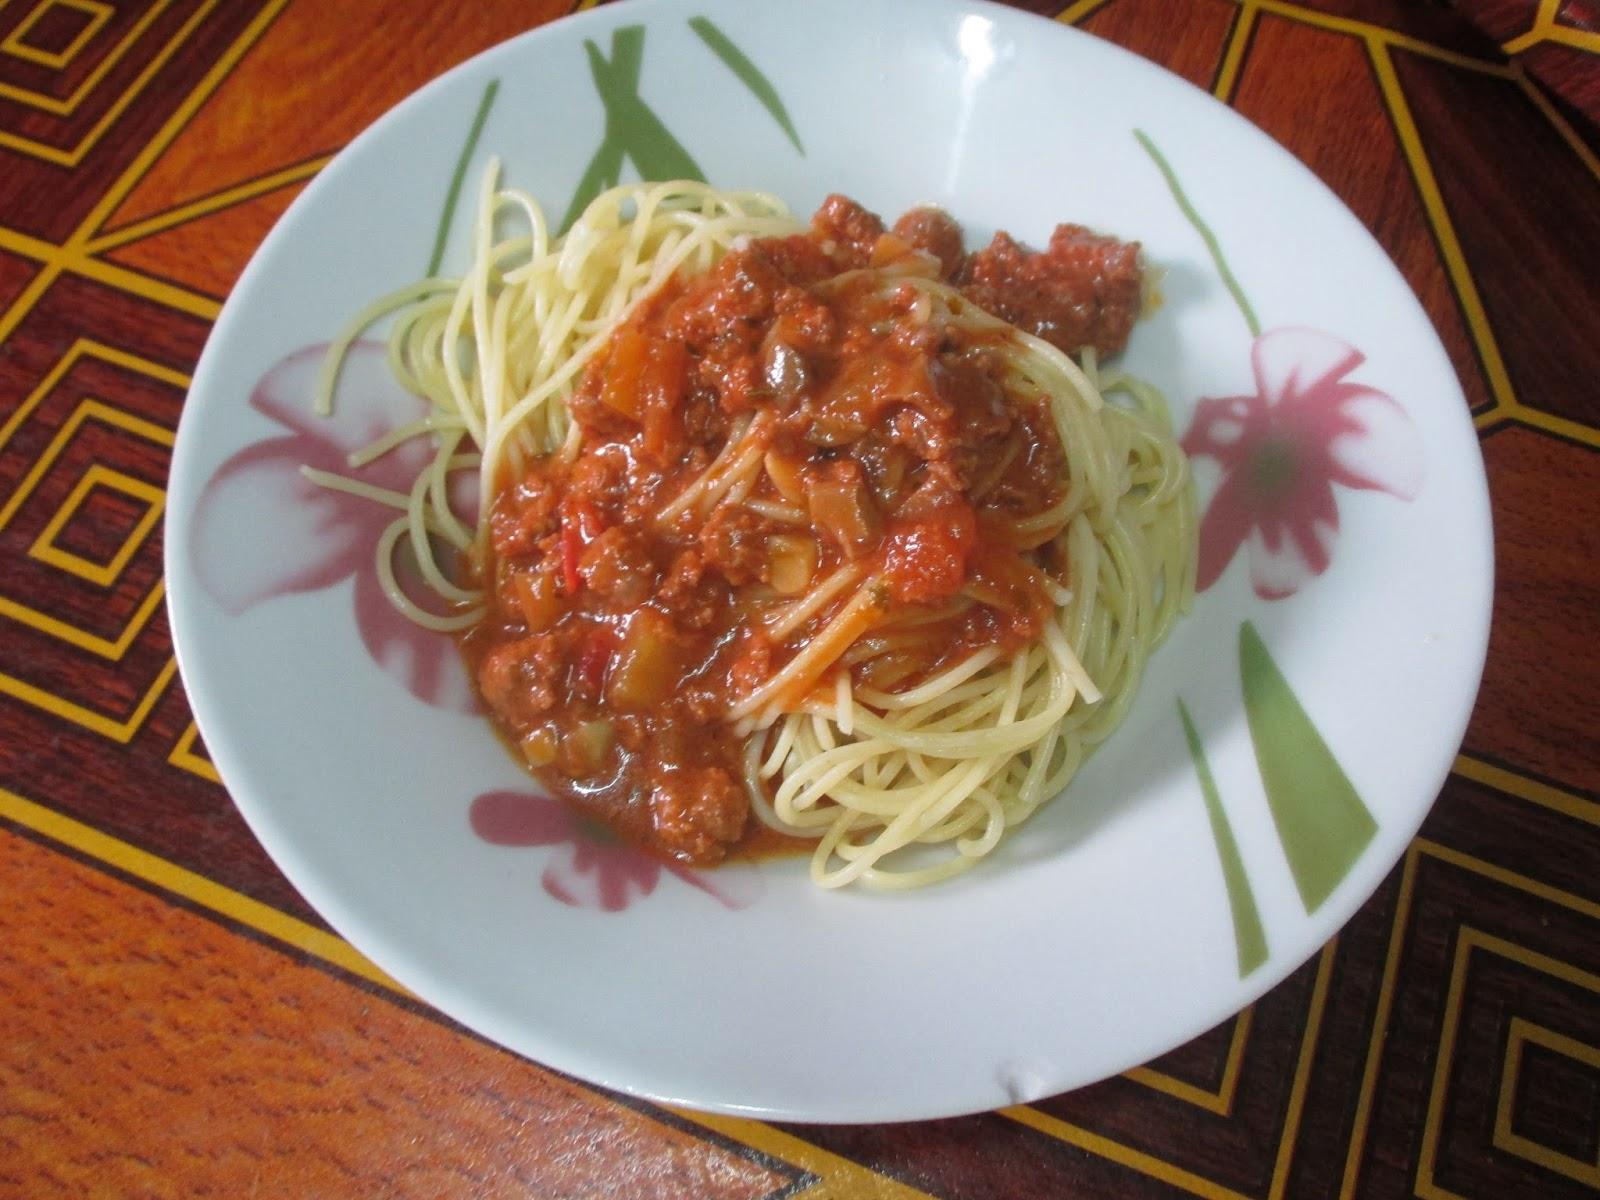 Resepi Spaghetti Bersos yang Enak dan Mudah | Azwar Syuhada